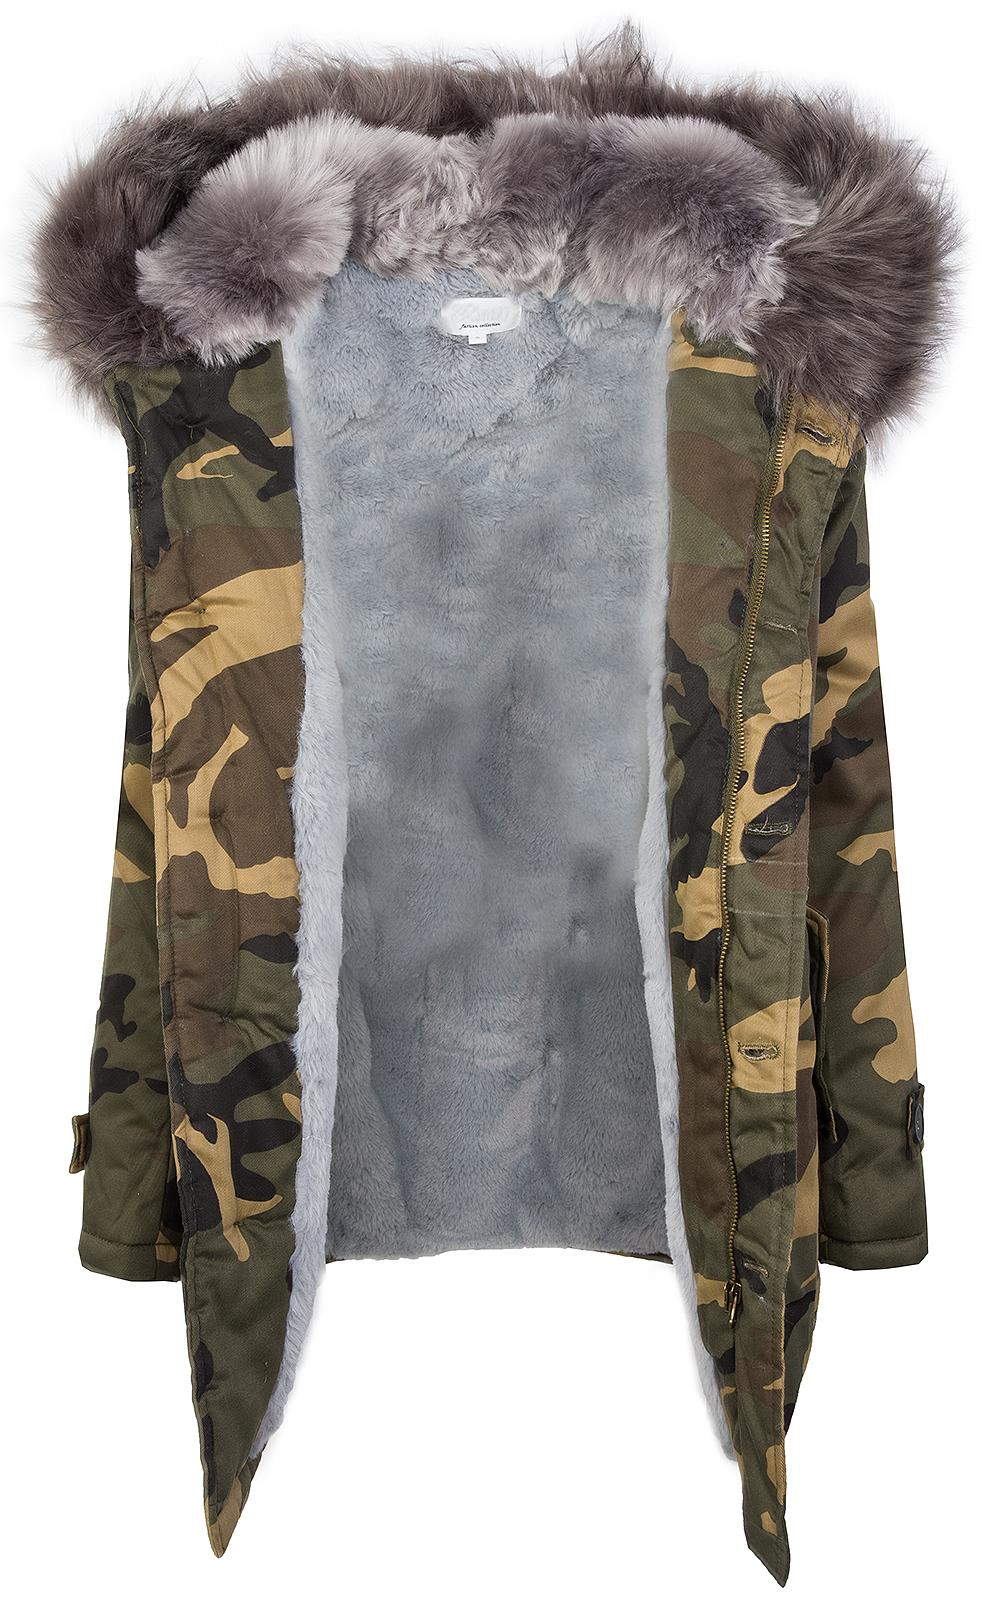 damen jacke camouflage parka gef ttert winterjacke army. Black Bedroom Furniture Sets. Home Design Ideas